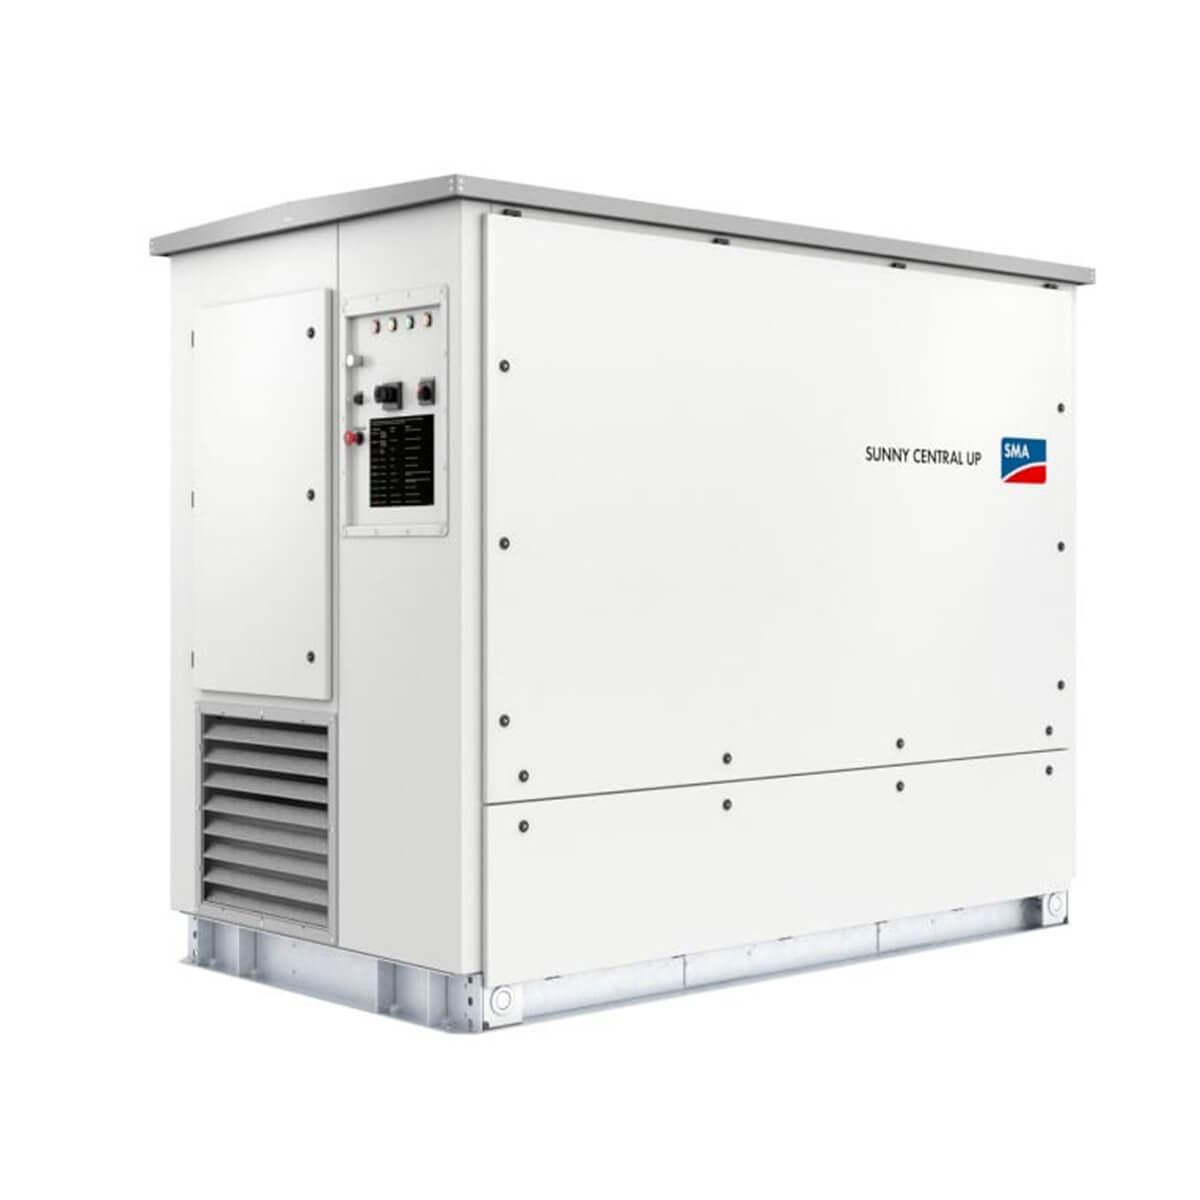 sma 4000kW inverter, sma sunny central 4000kW inverter, sma sunny central 4000 up inverter, sma sunny central 4000 up, sma sunny central 4000 kW, SMA 4000KW